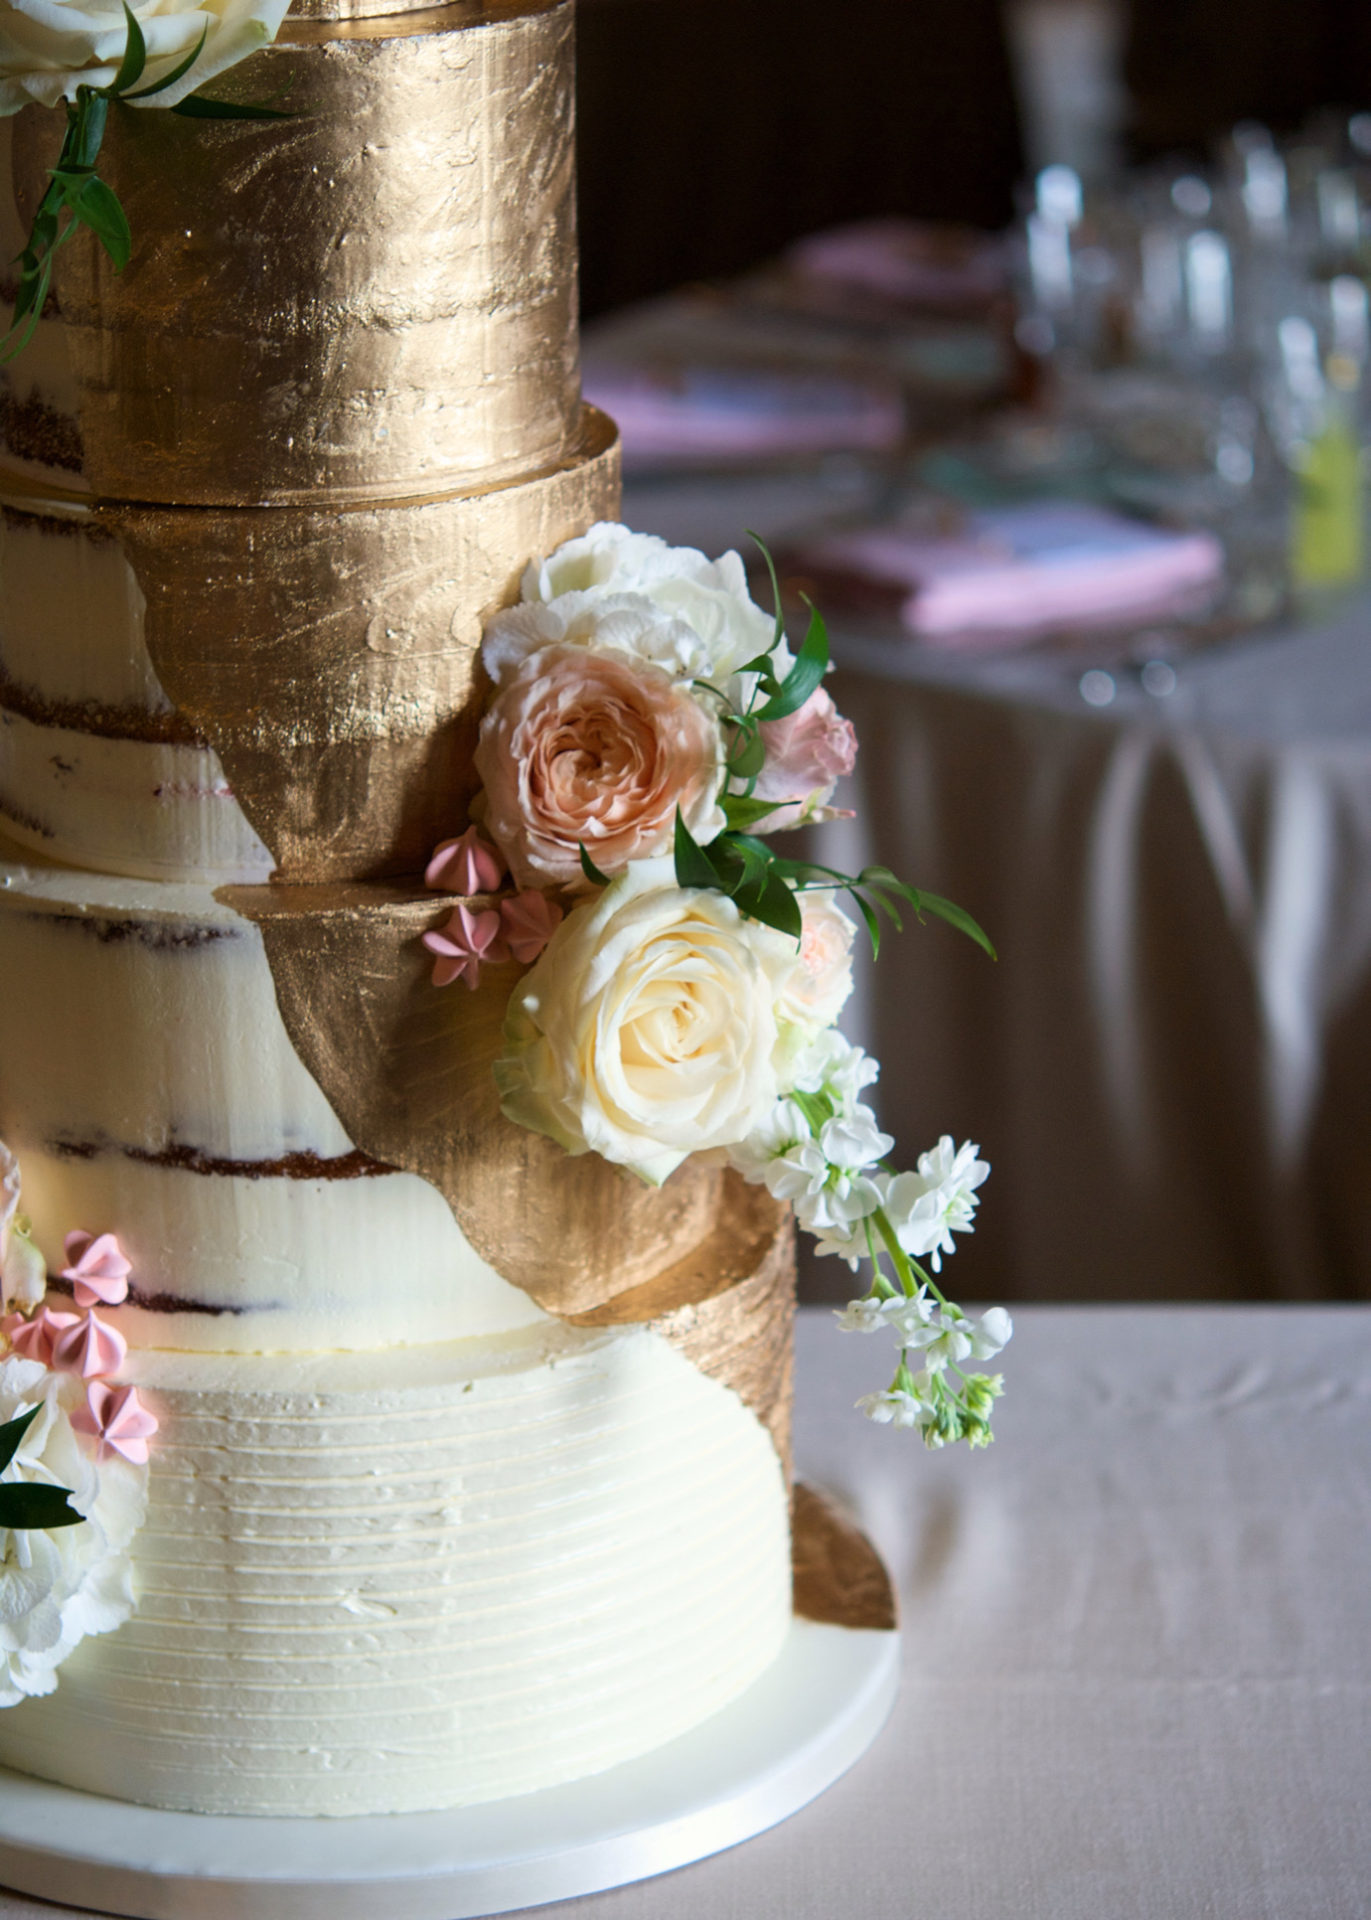 Master class tartas naked cake, tartas para eventos, gold wedding, fresh flowers, mericakes, tartas de boda, wedding cake, curso de reposteria, barcelona, 4